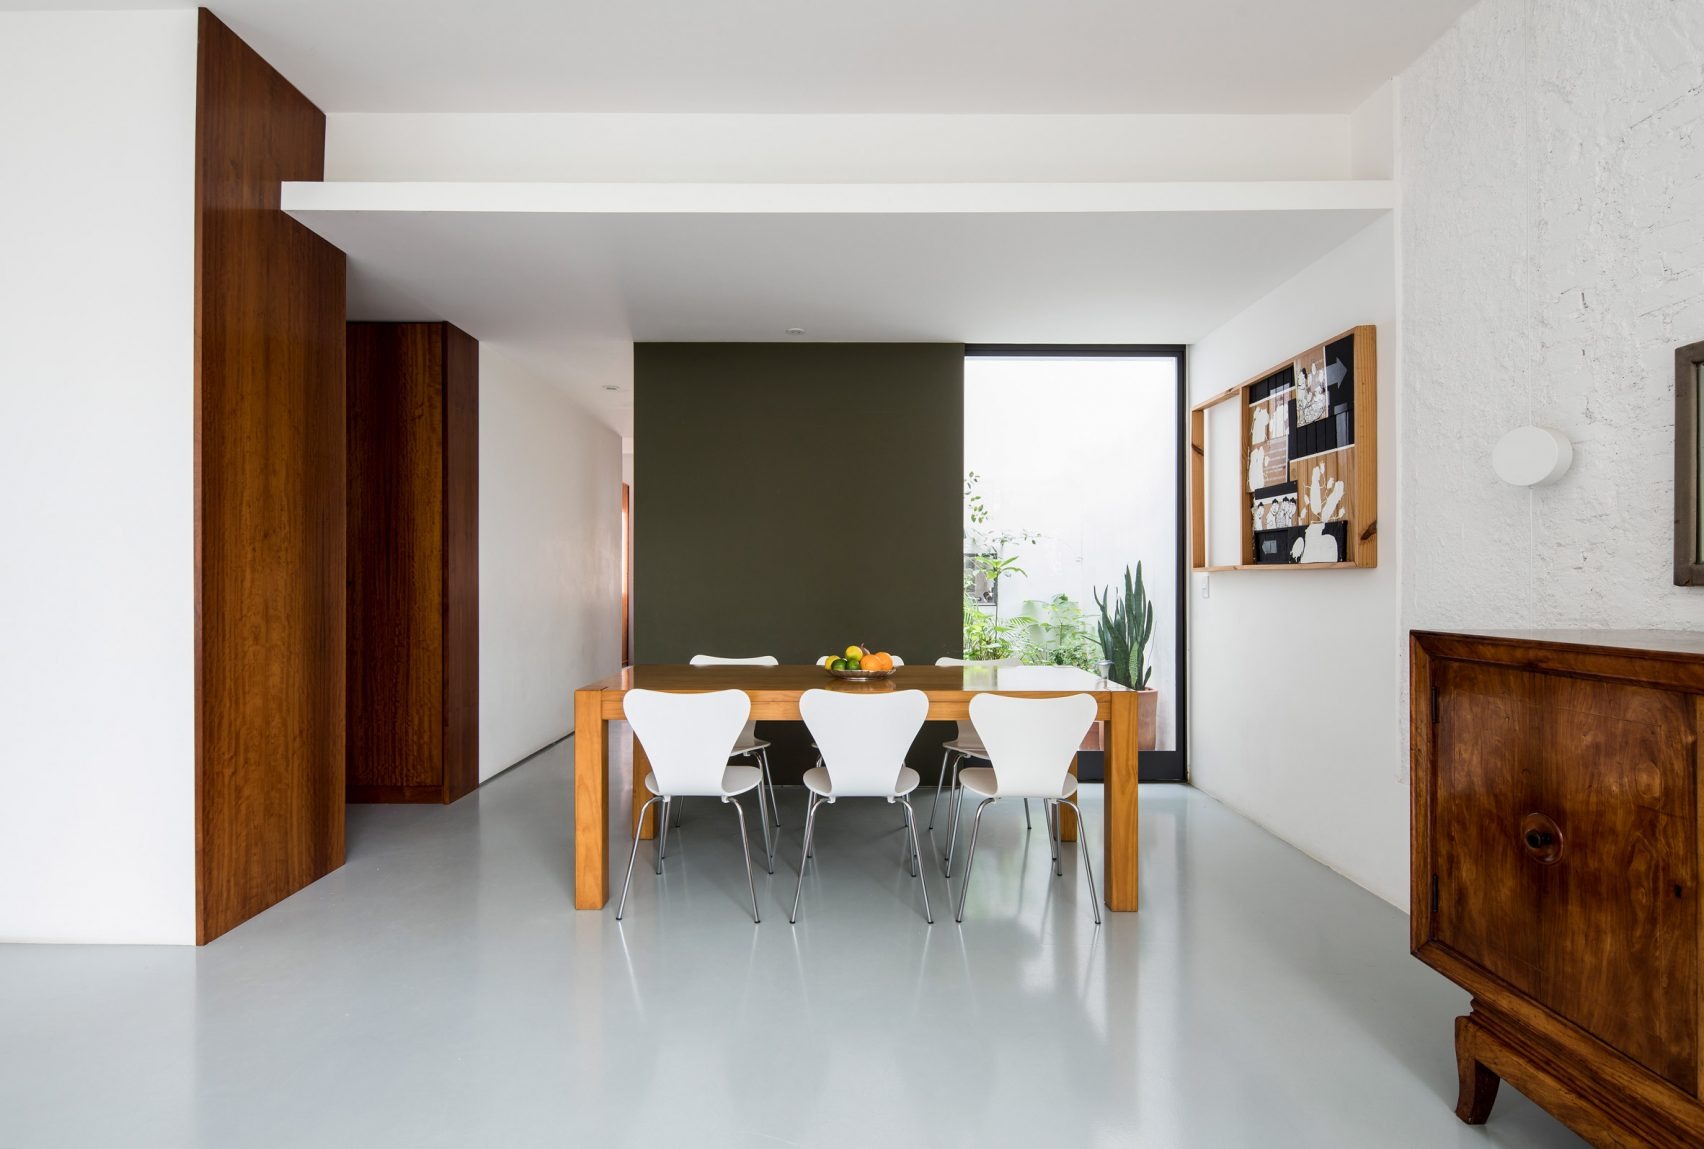 tucuma-apartment-cupertino-arquitetura-sao-paulo-brazil_dezeen_2364_col_6-1704x1149